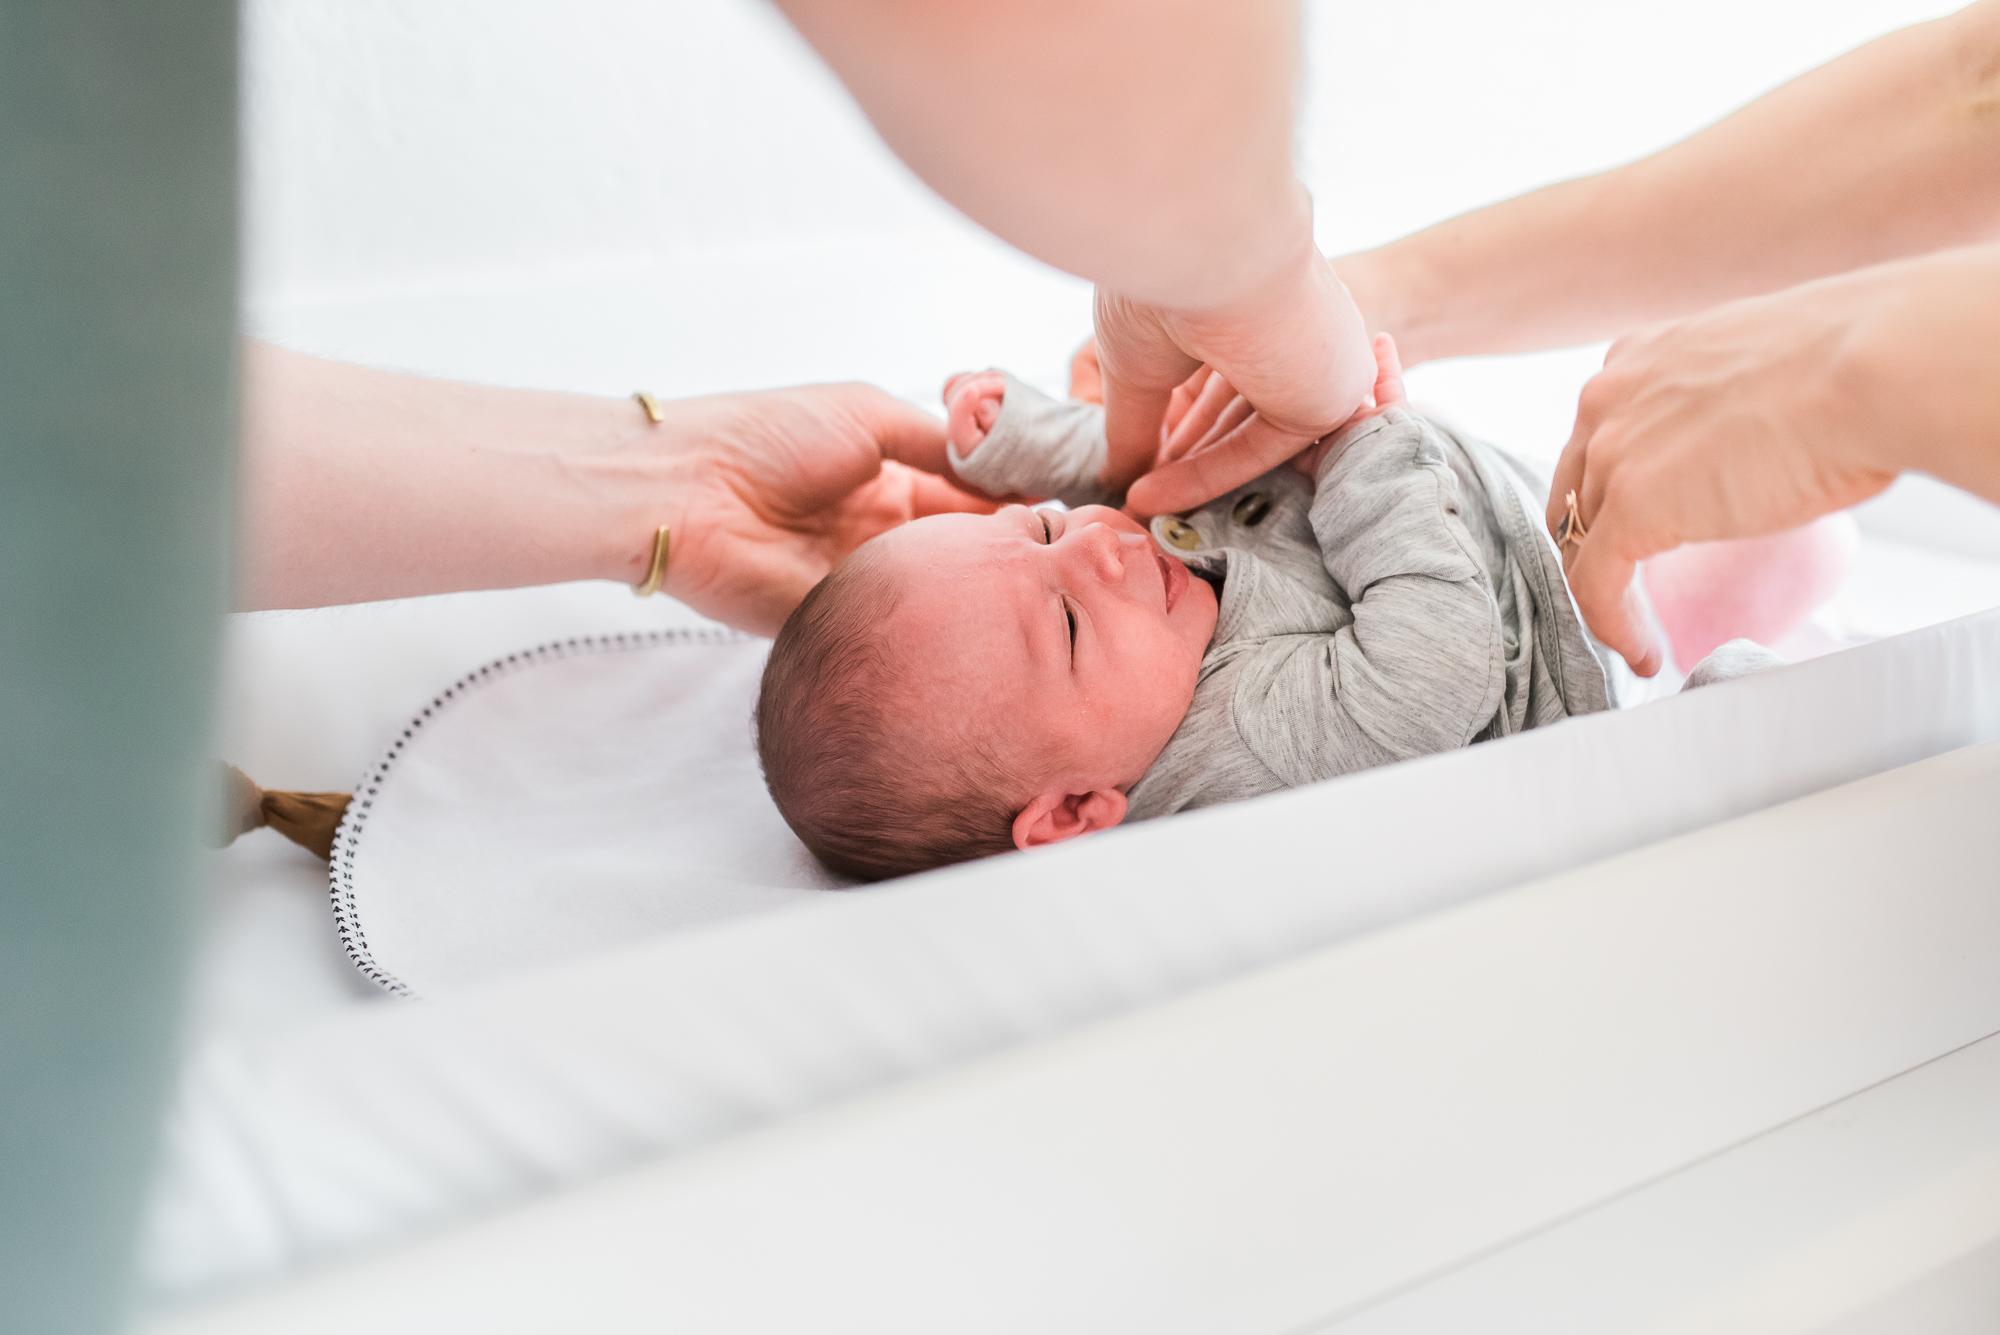 southwest theme nursery, nursery decor, parents with baby in nursery, newborn lifestyle photos